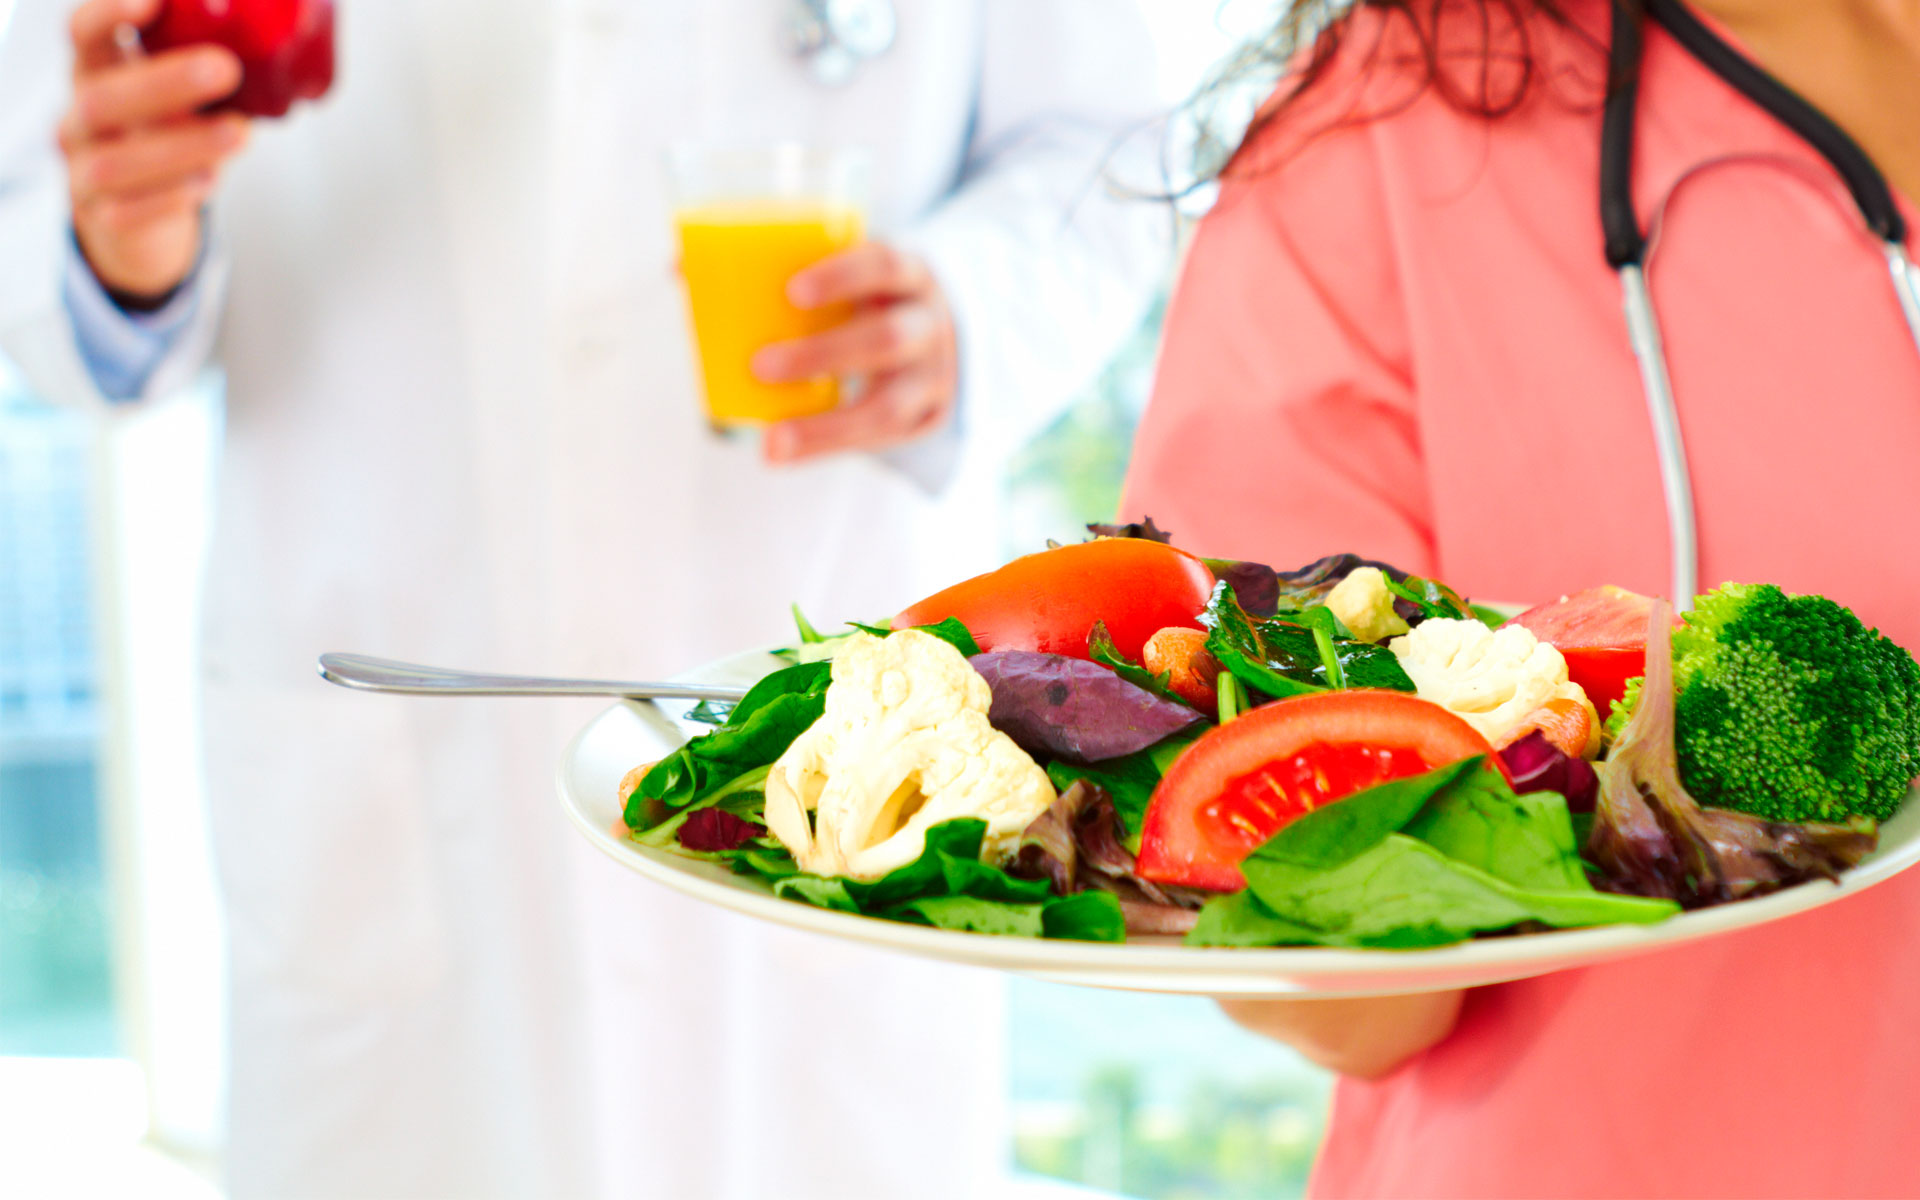 Asistencia nutricional - Quality Assist